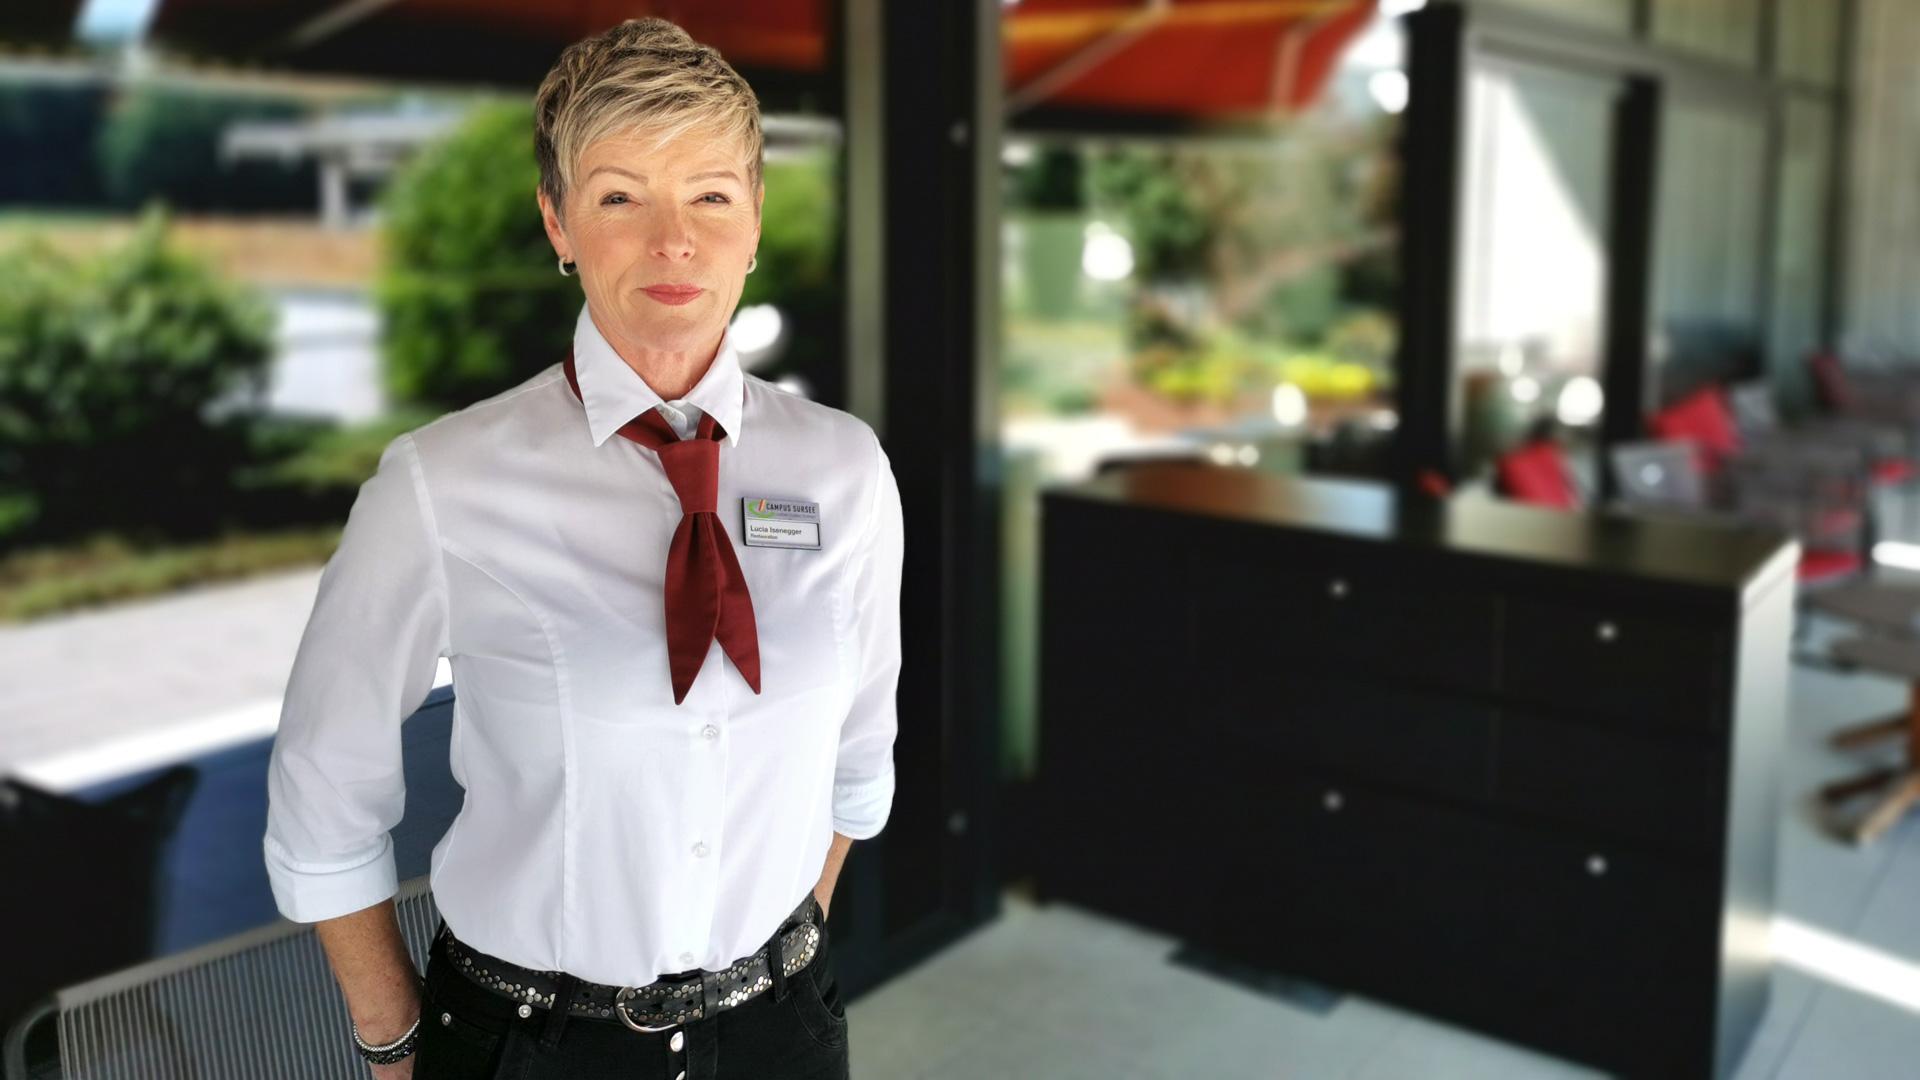 Lucia Isenegger, Servicemitarbeiterin